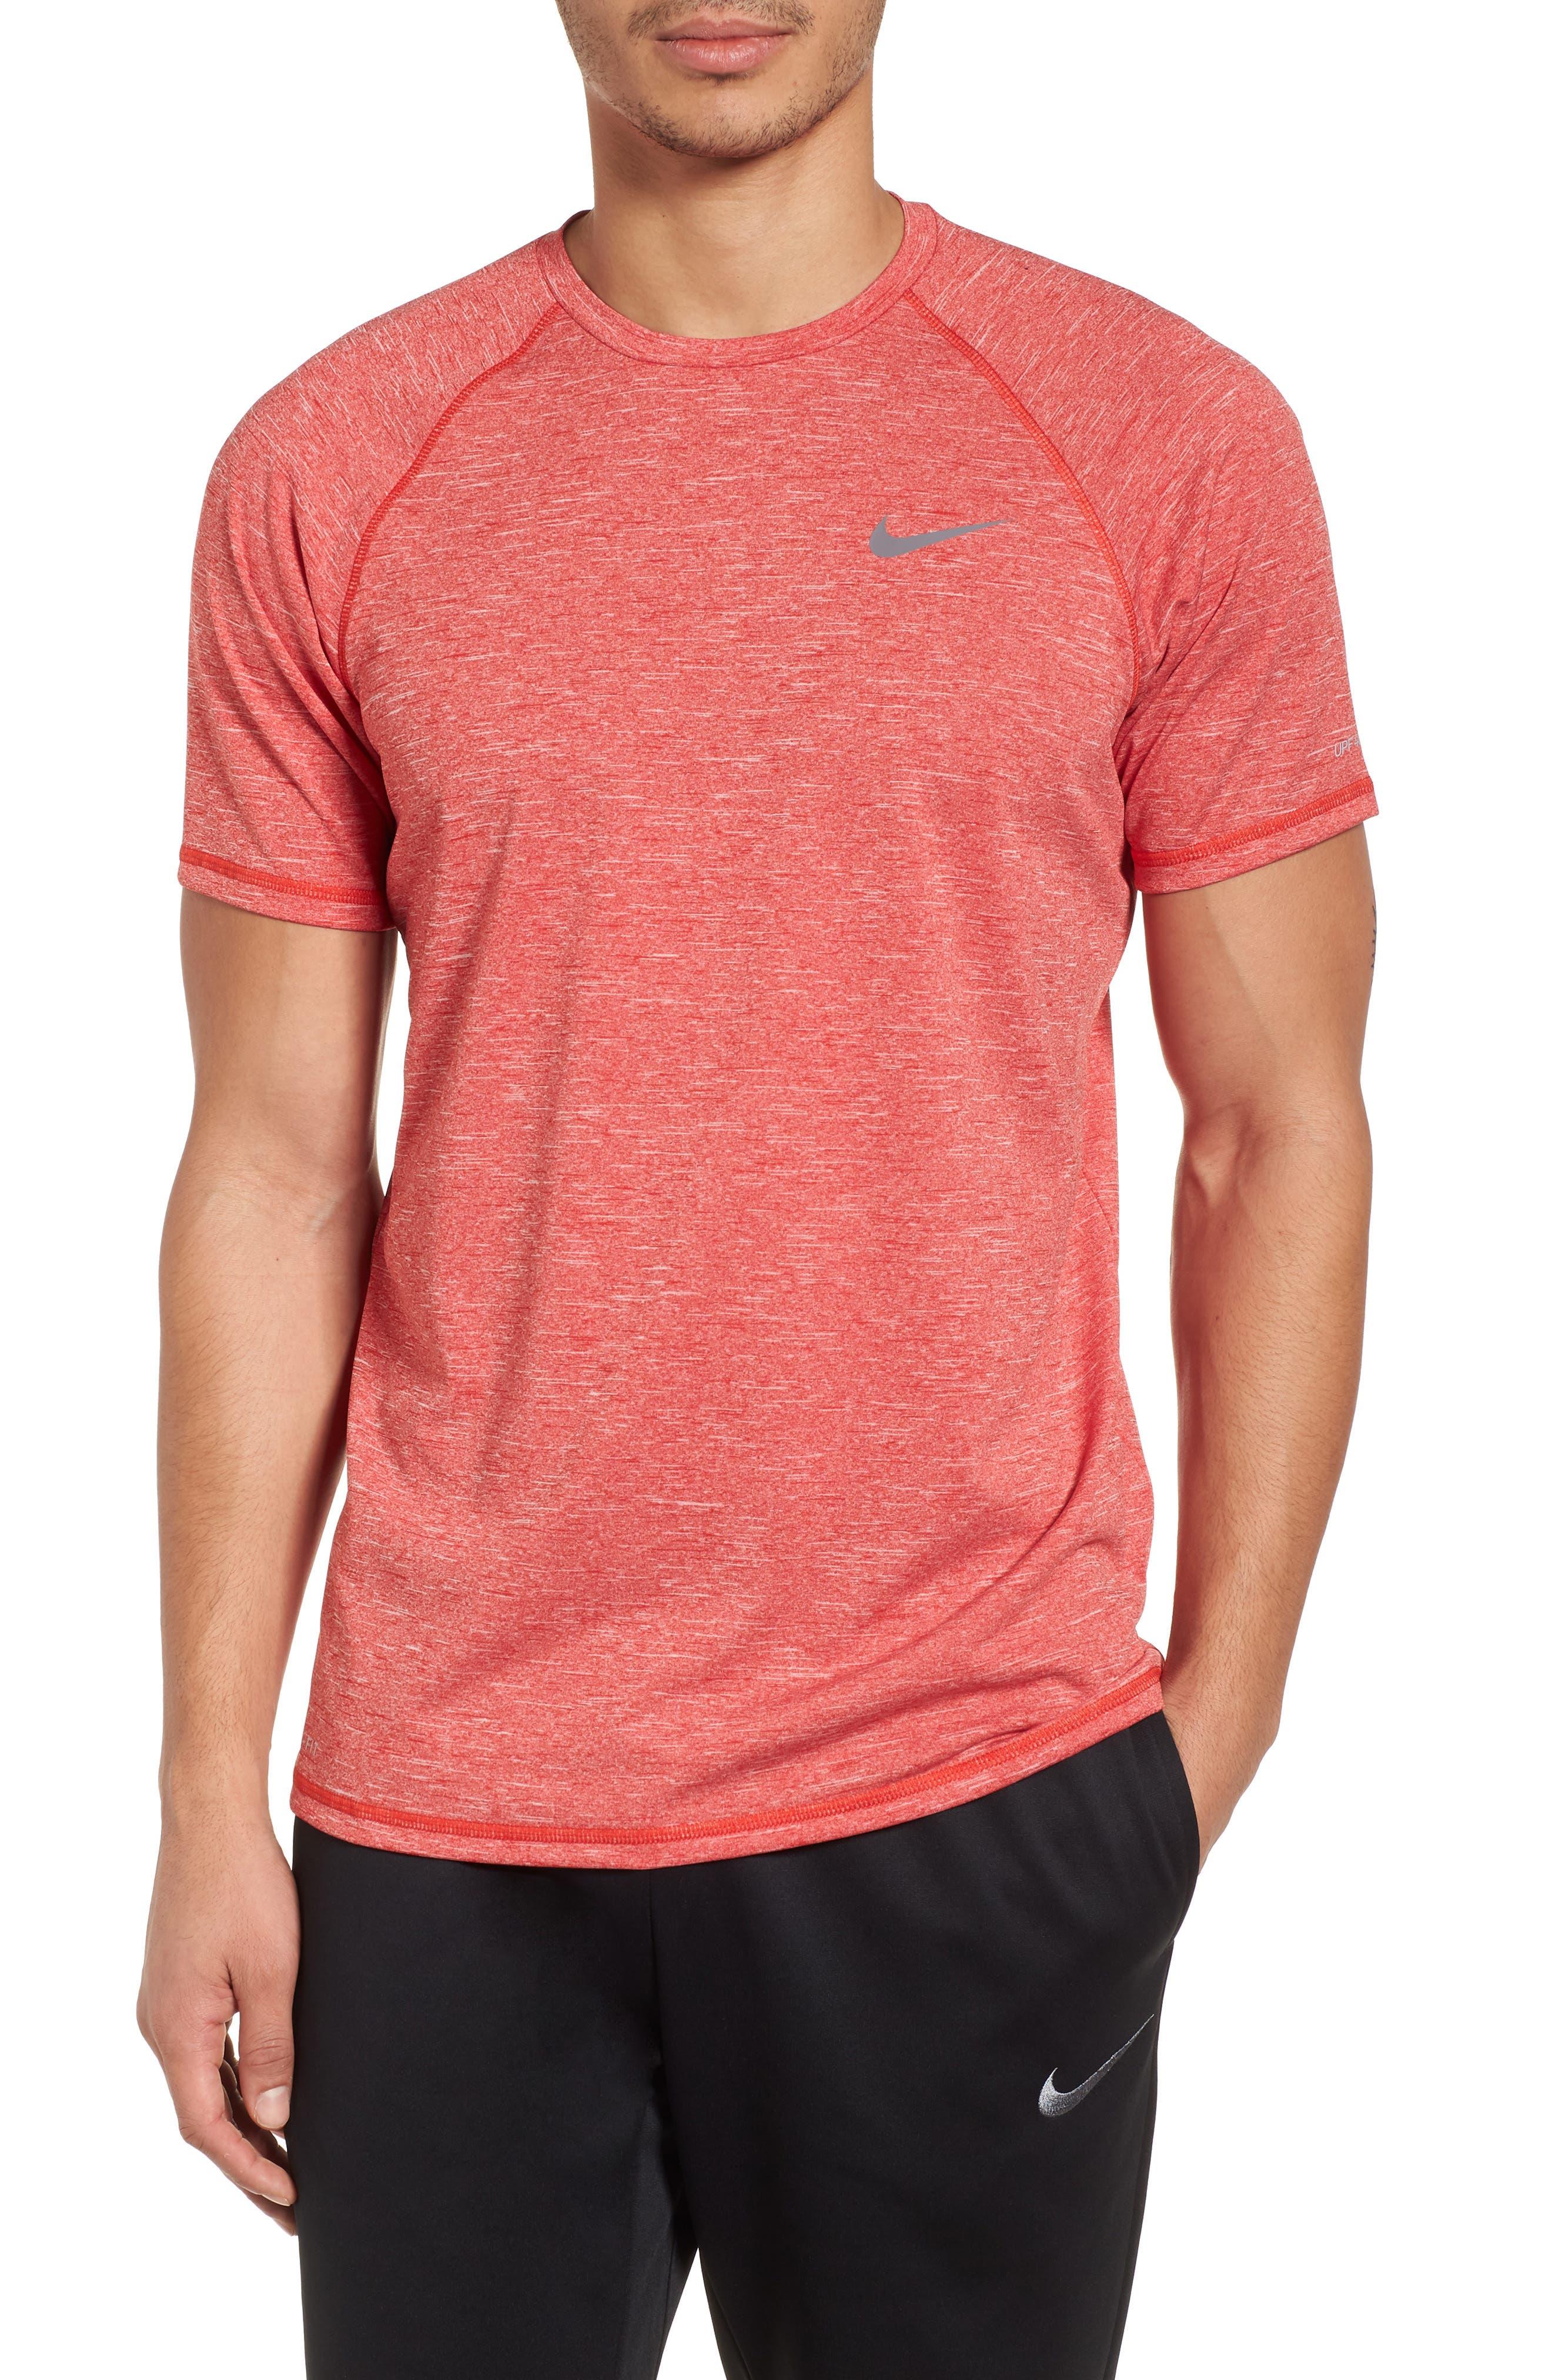 Dry Hydroguard T-Shirt,                             Main thumbnail 1, color,                             University Red